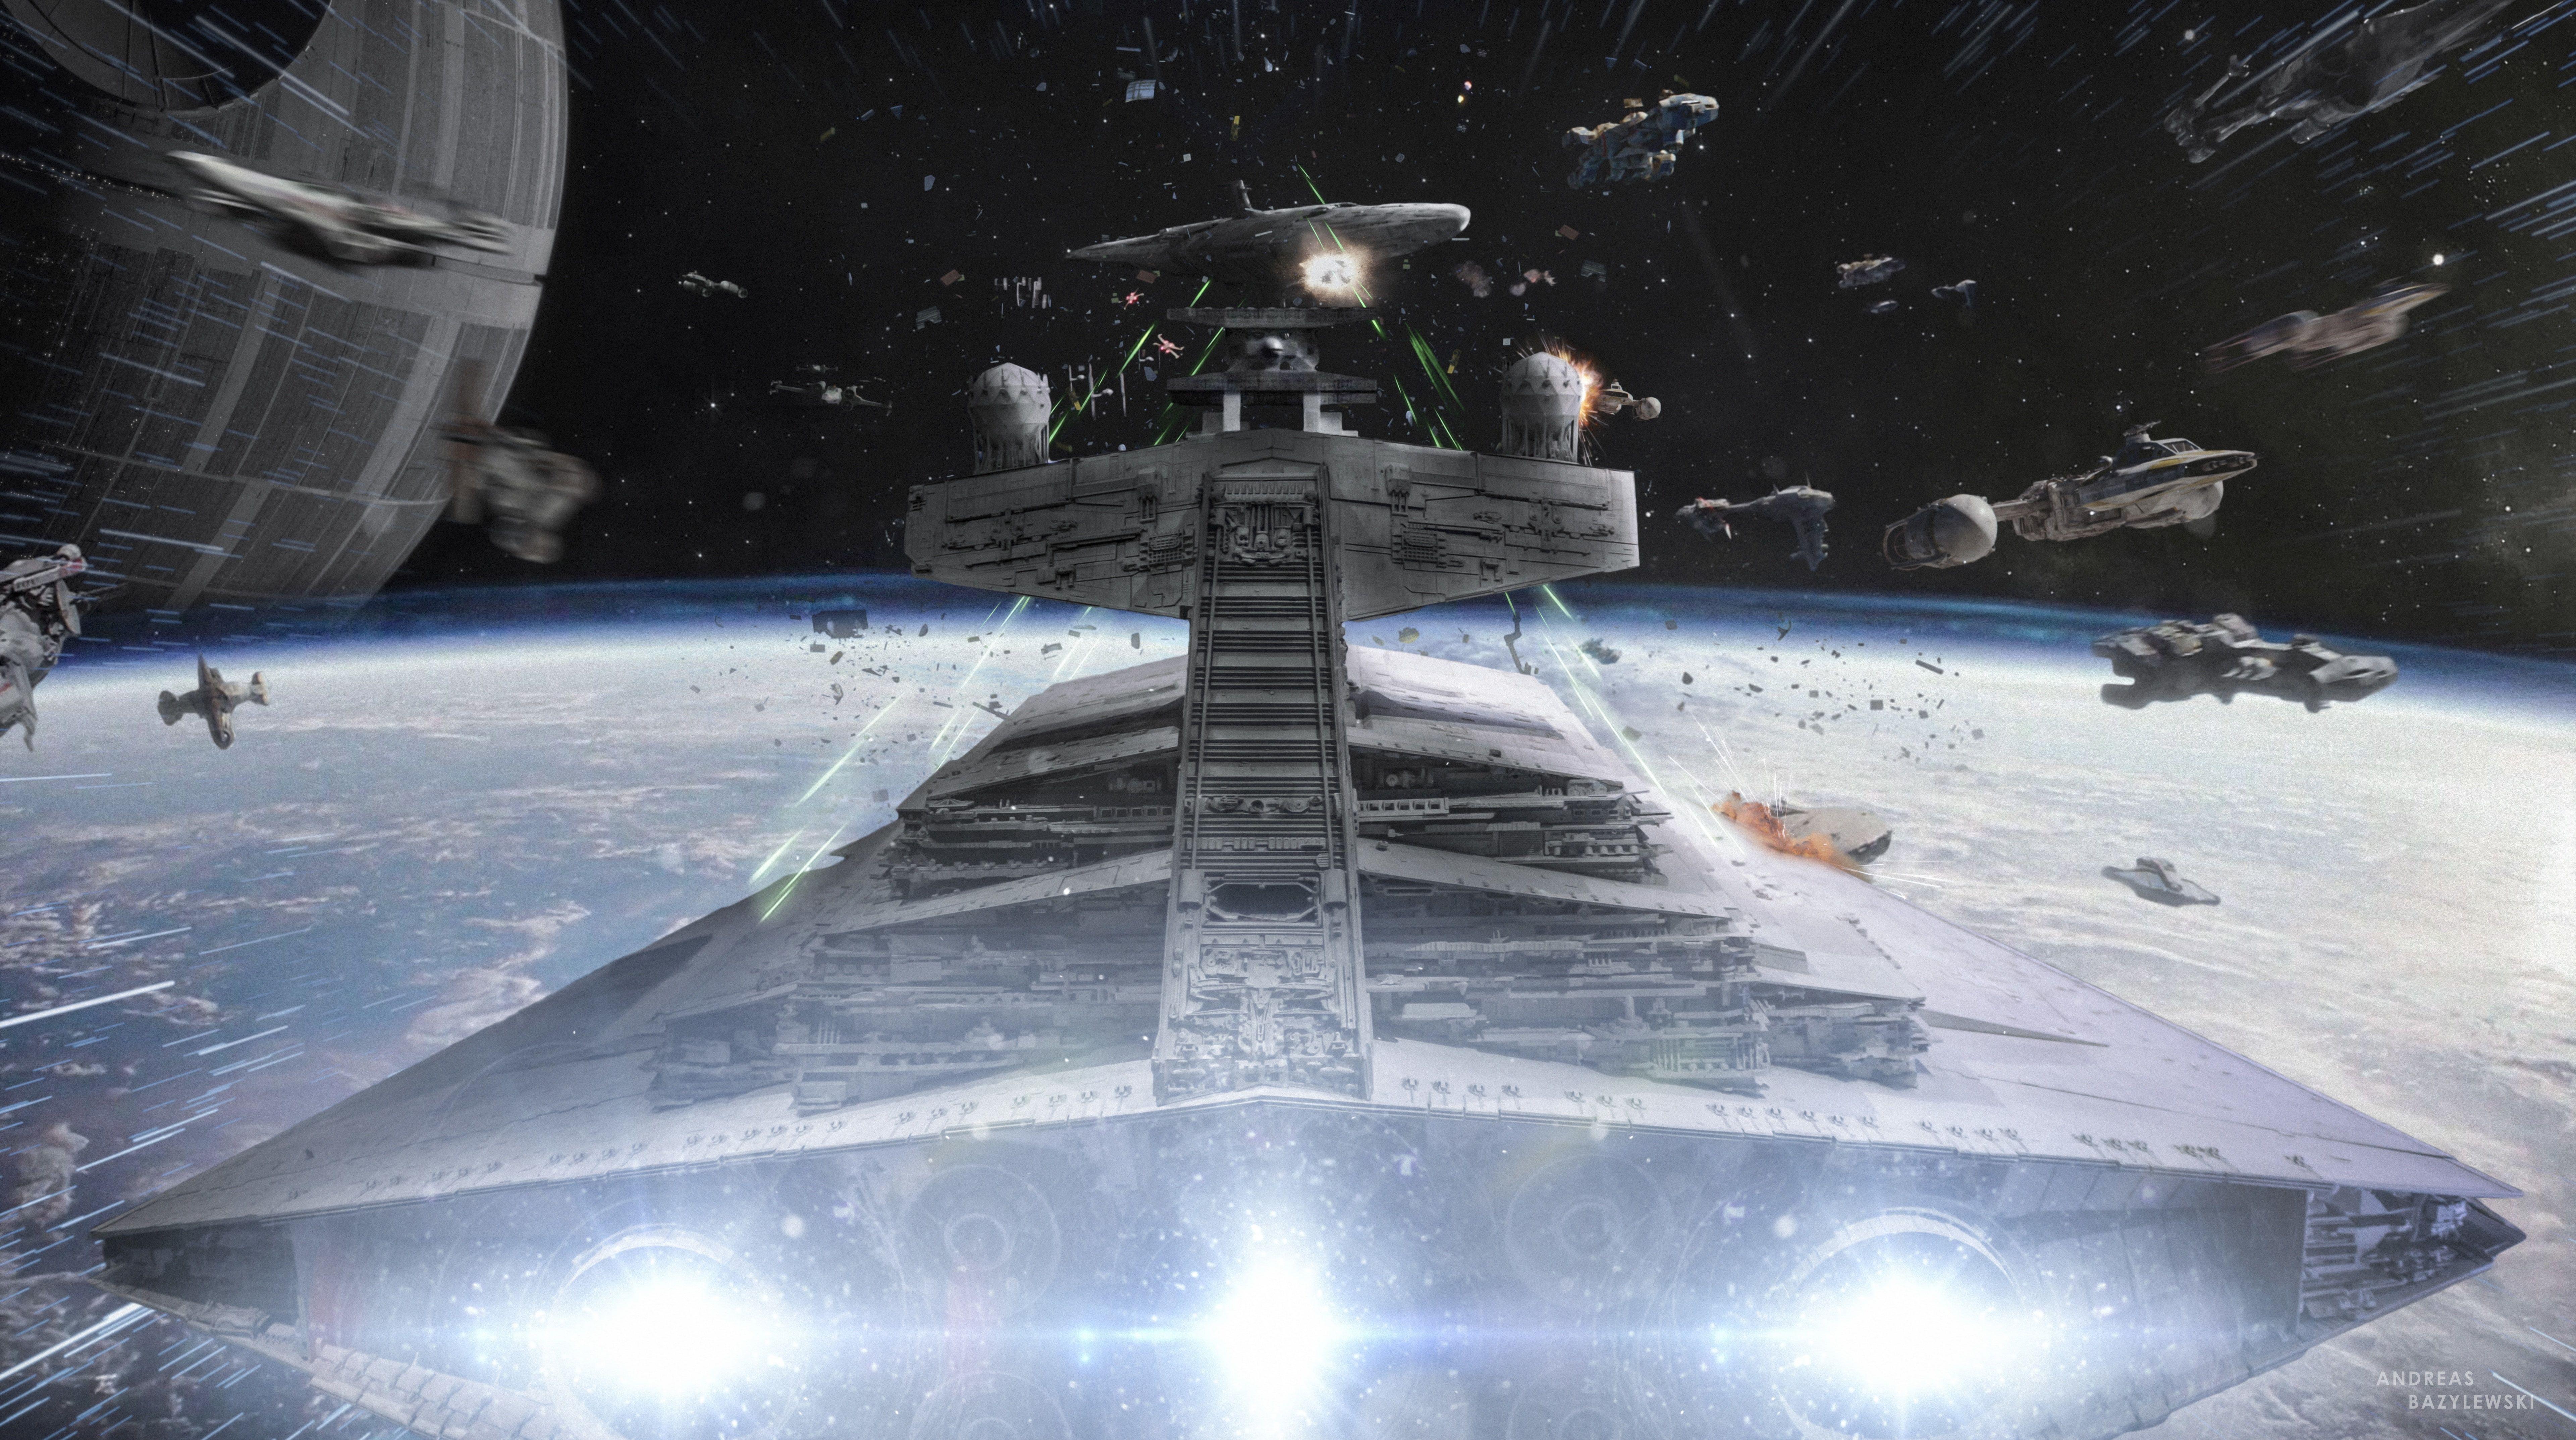 Out Of Hyperspace Star Wars War Of Spaceships Digital Wallpaper Movies Star Wars Firstorder Fleet Fighter S In 2020 Digital Wallpaper Star Wars Star Wars Artwork